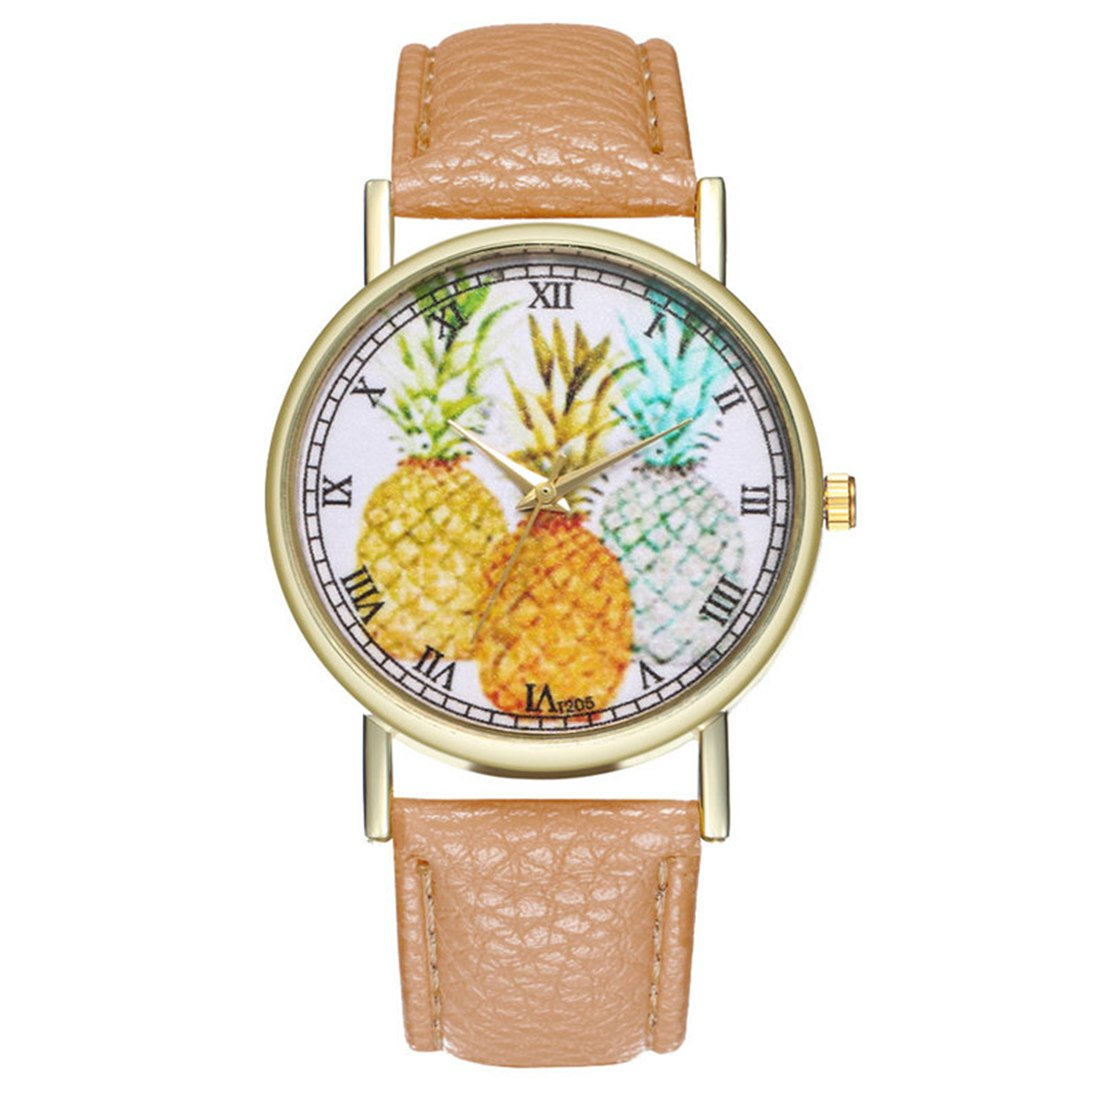 Loweryeah Pineapple Dial Leather Couple Quartz Wrist Watch